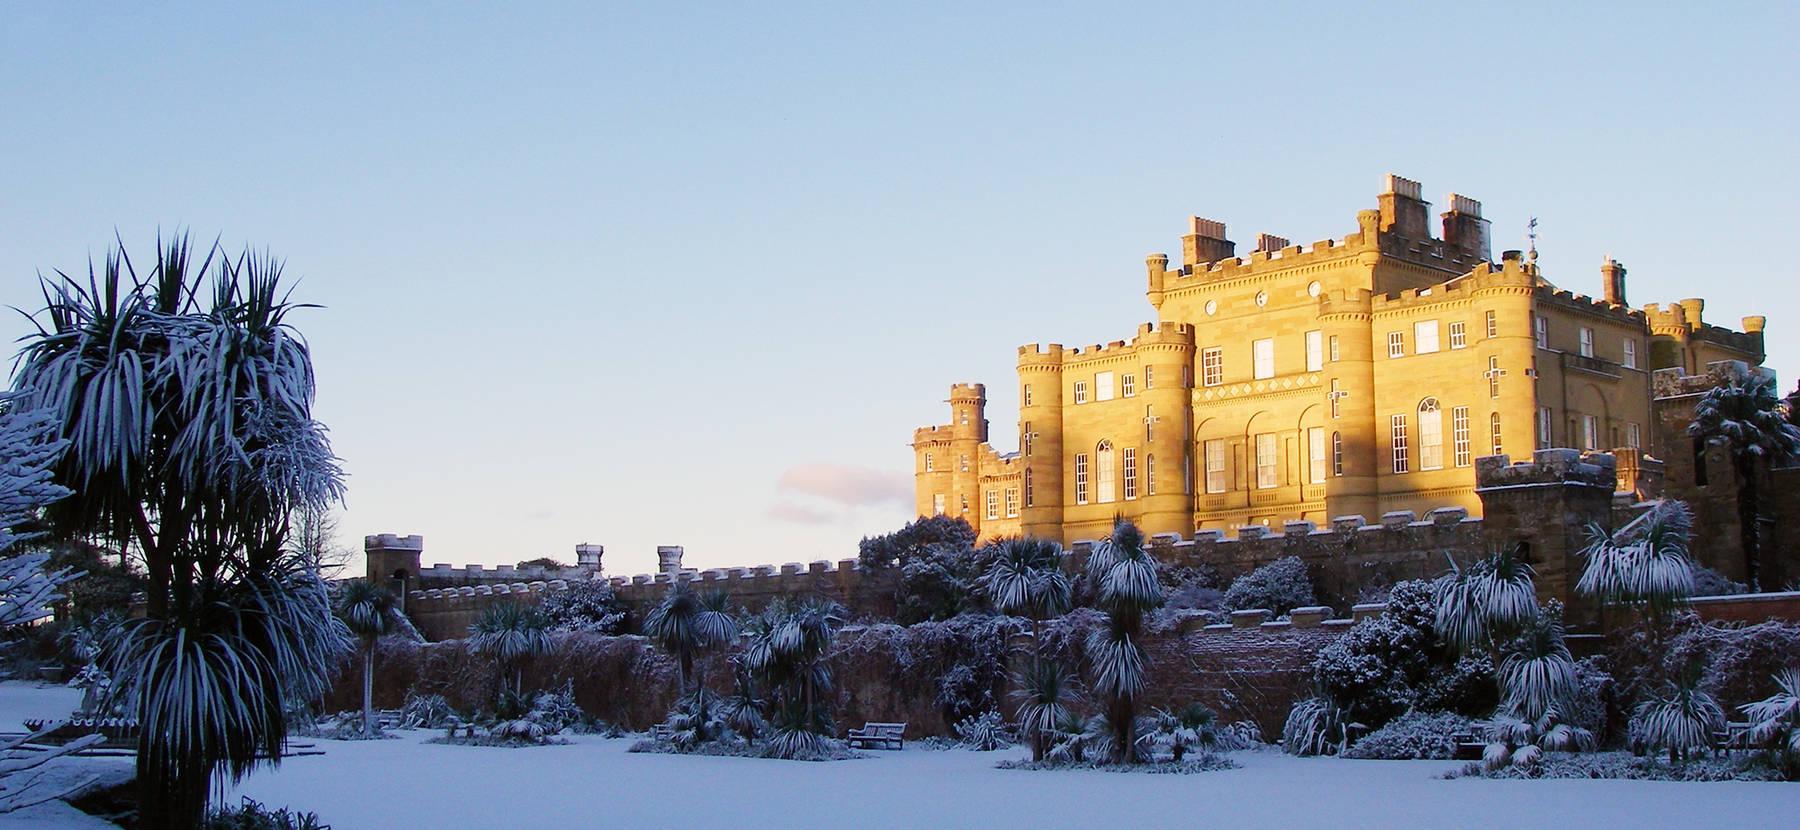 culzean castle national trust for scotland